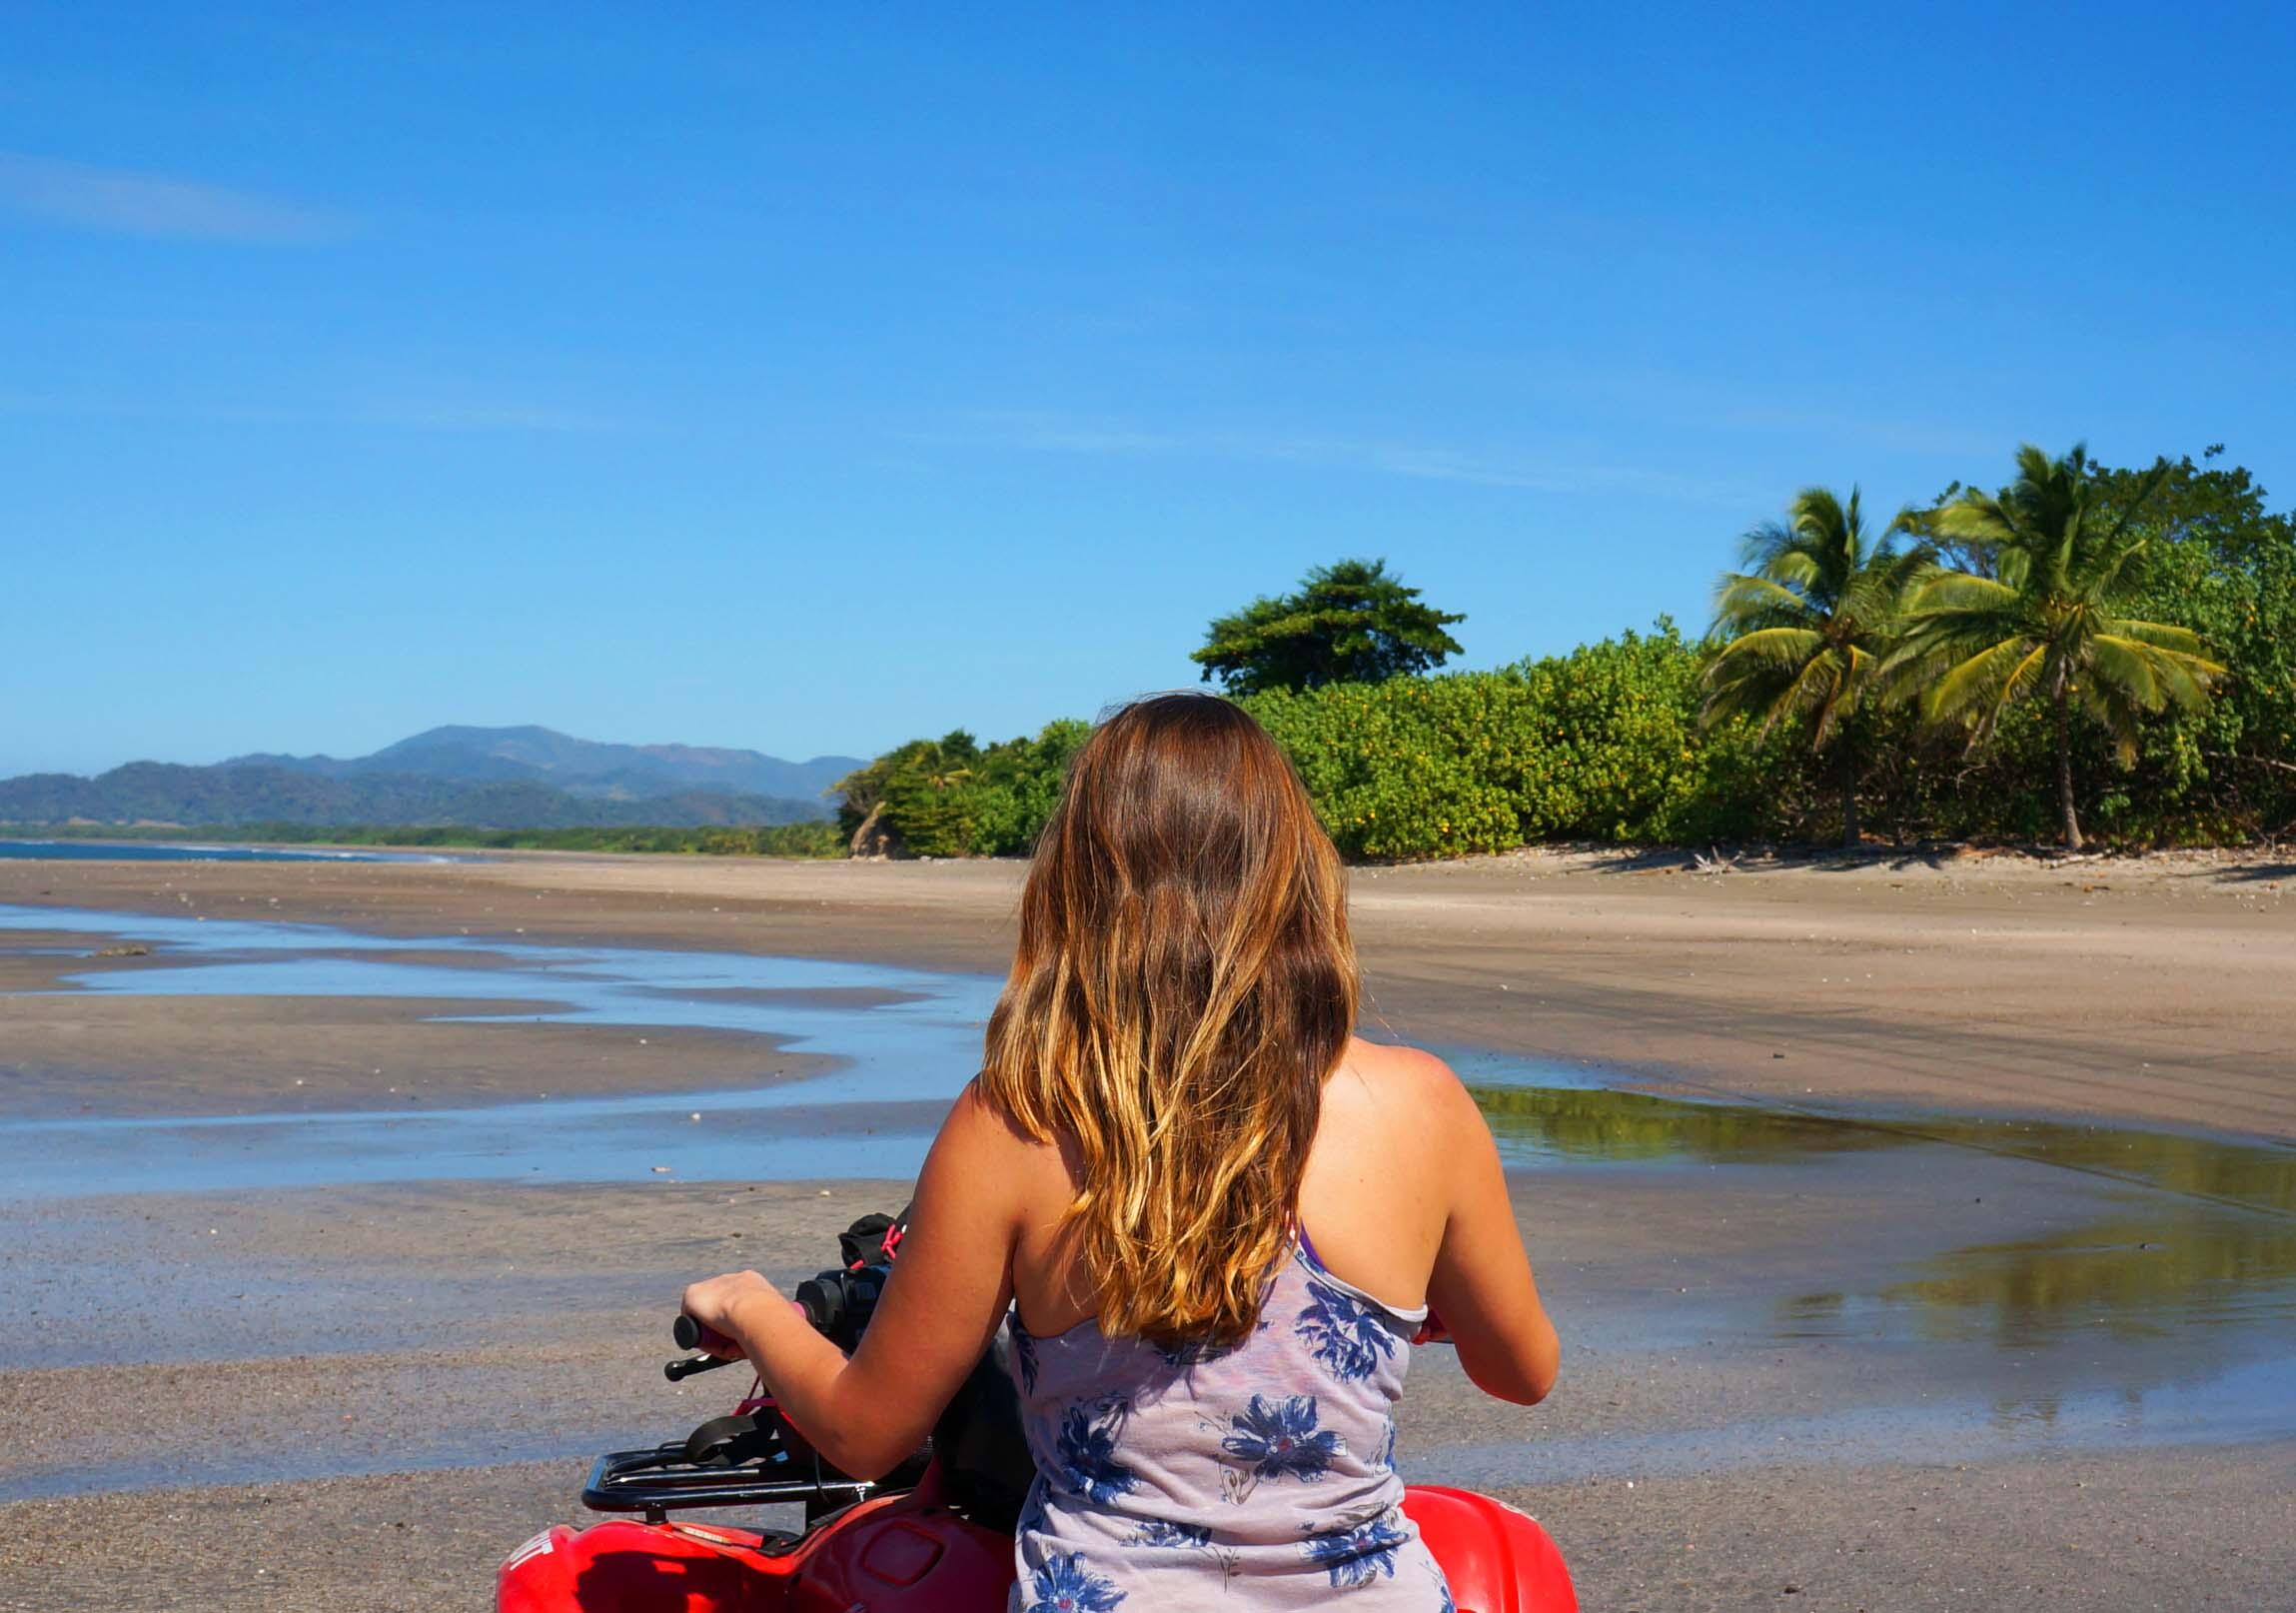 beach exploring with an atv rental in santa teresa featured